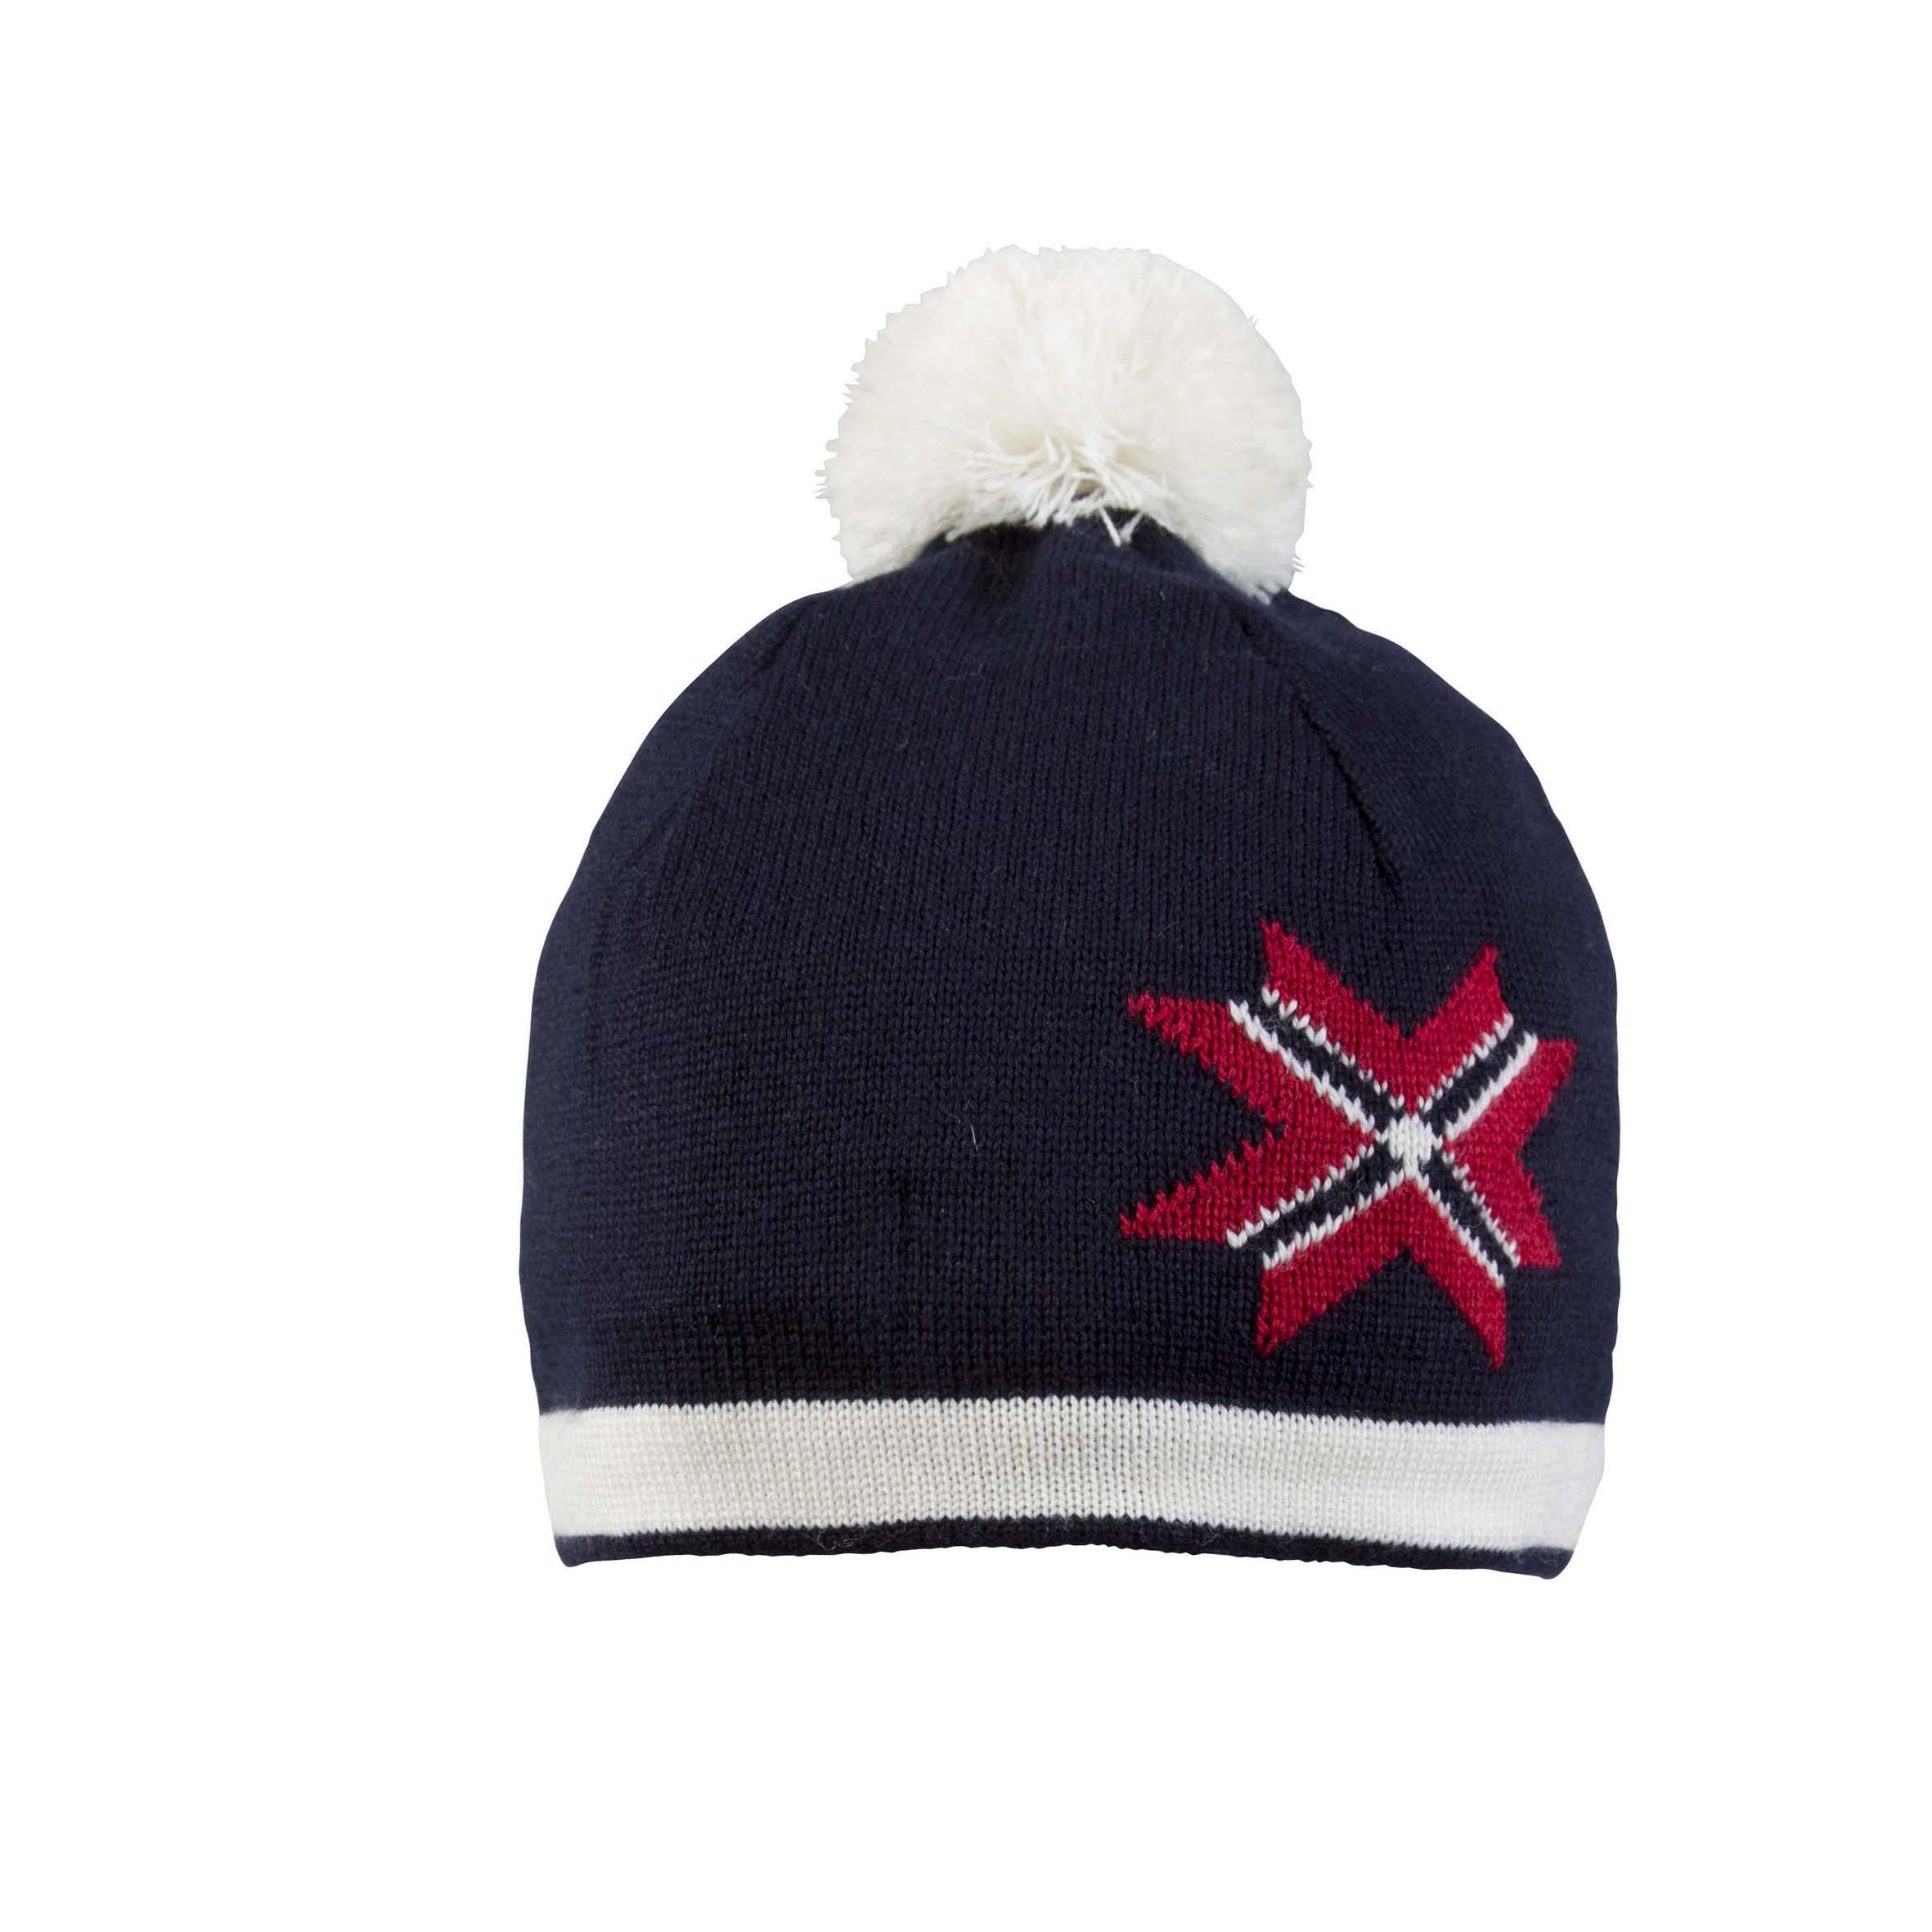 Navy / Off White / Raspberry (C)